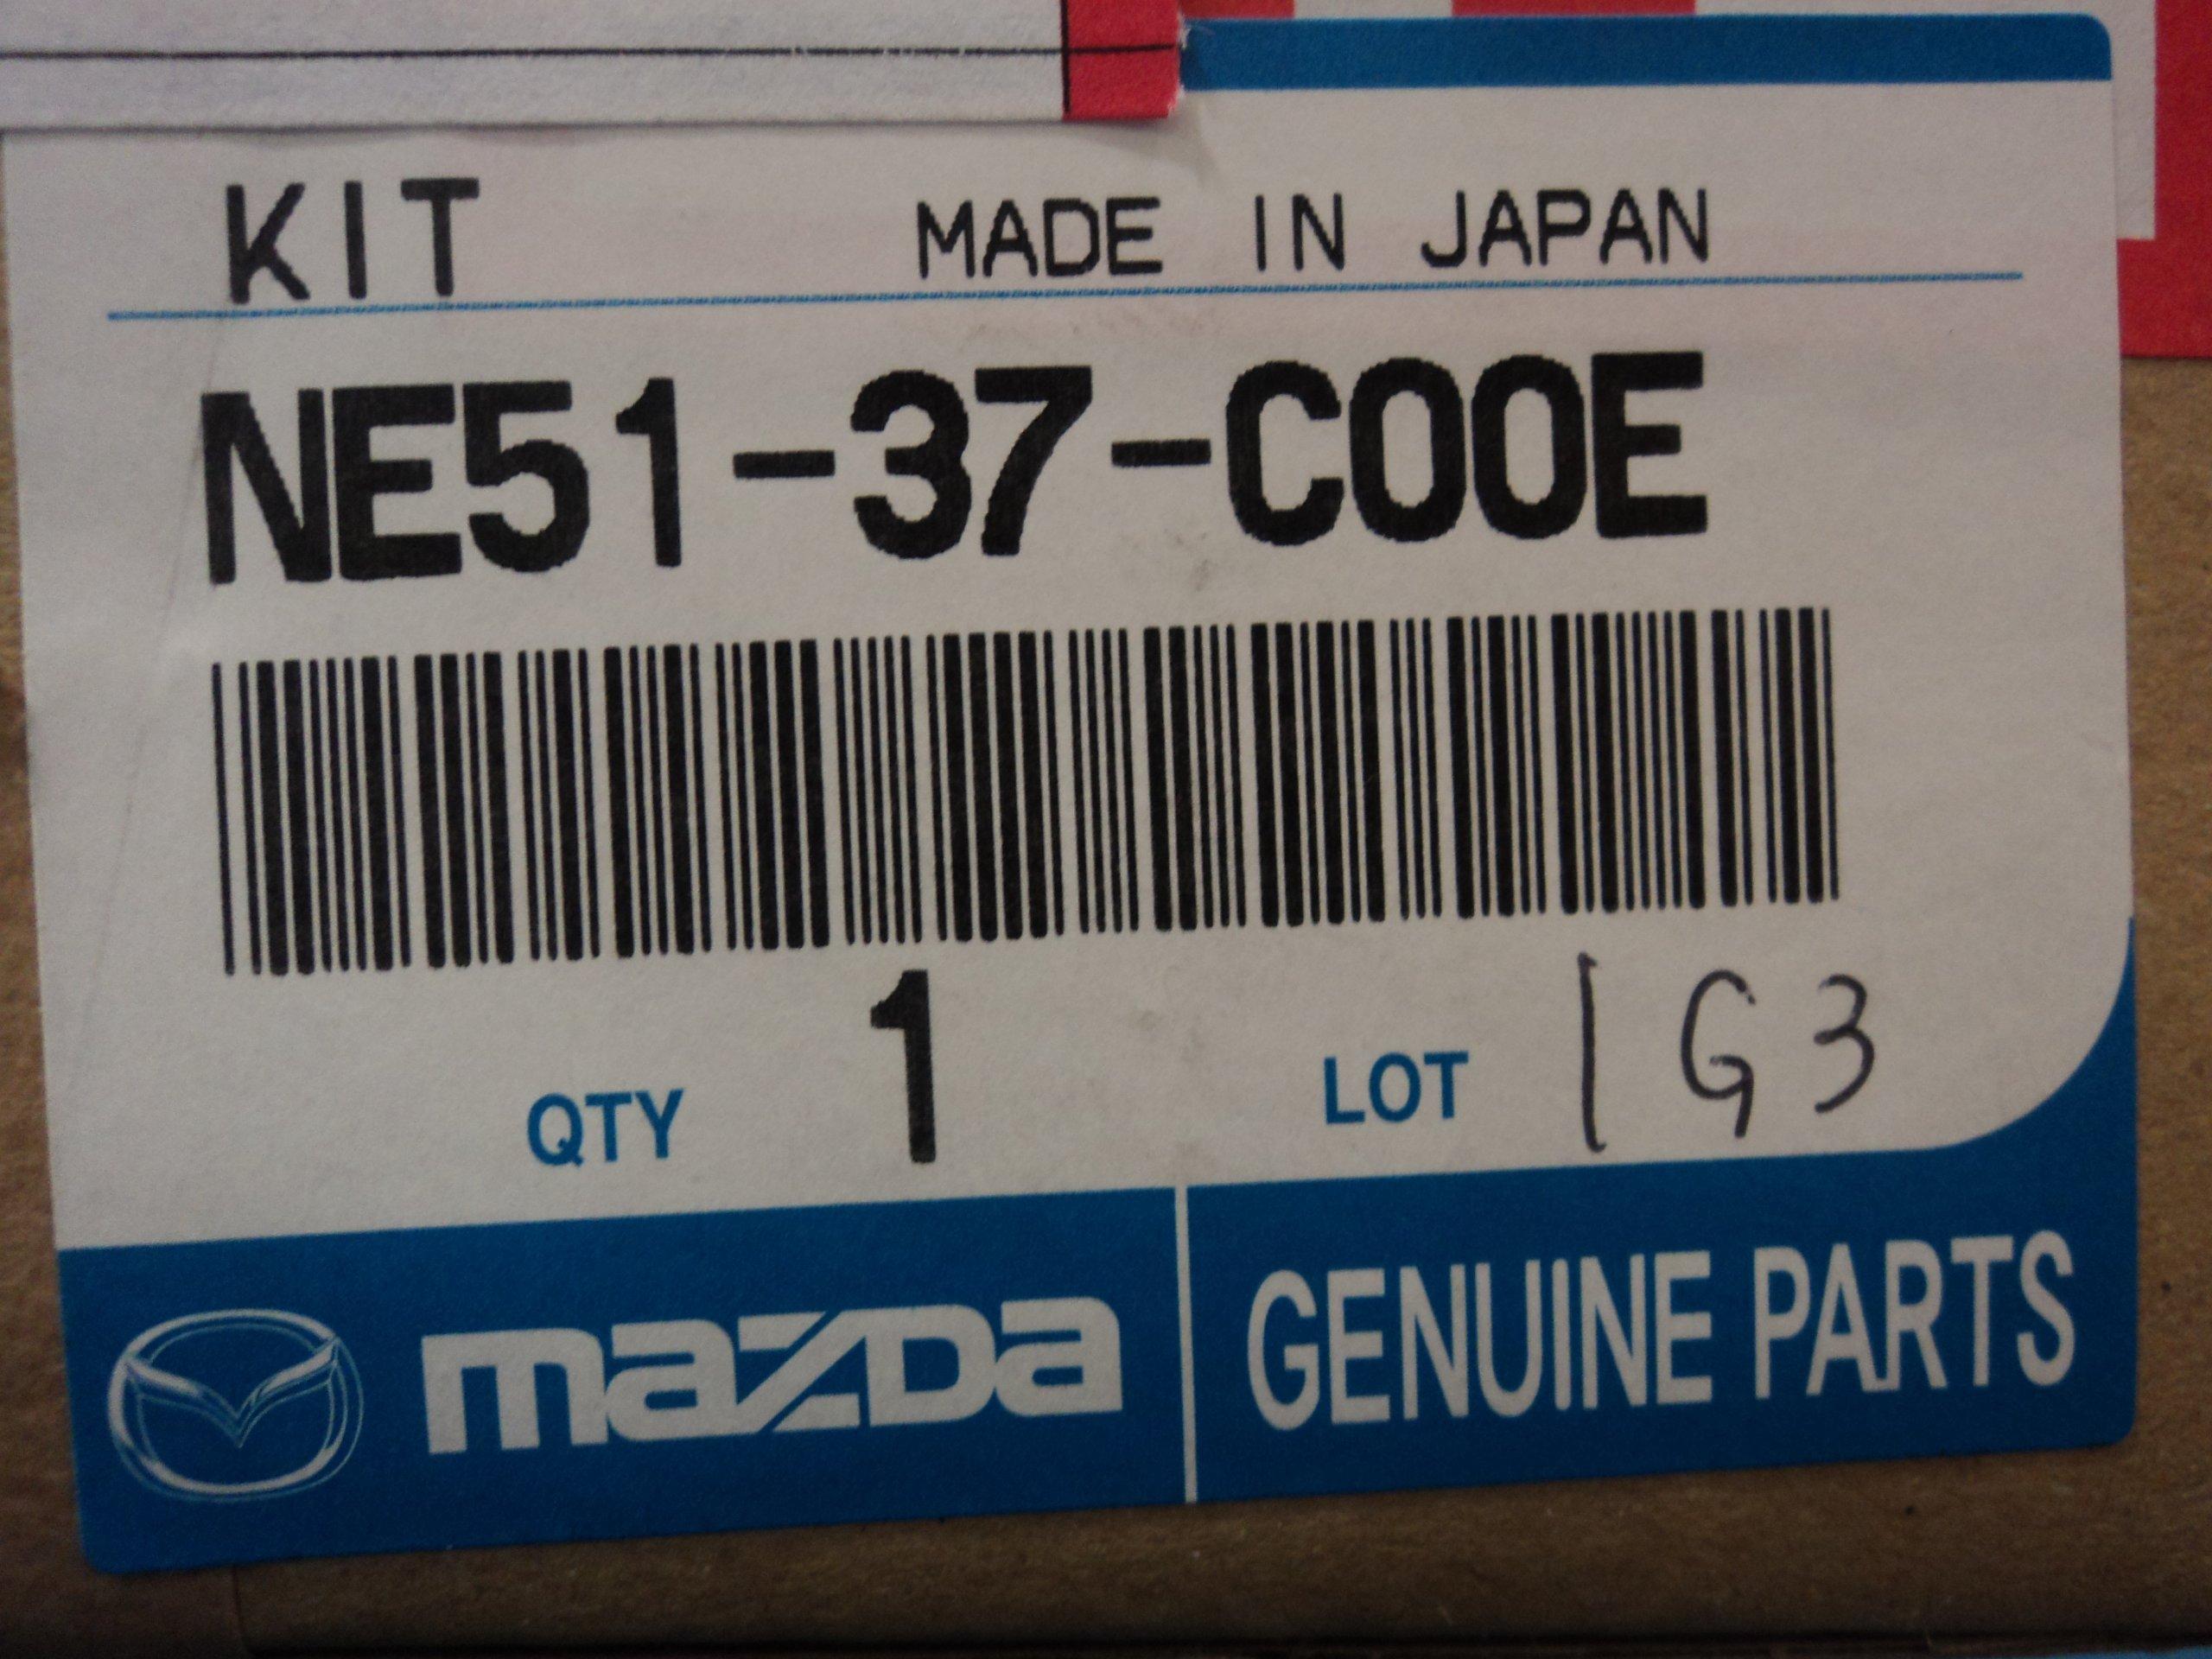 MAZDA MIATA MX-5 2006-2013 NEW OEM TIRE PUNCTURE REPAIR KIT by Mazda (Image #2)